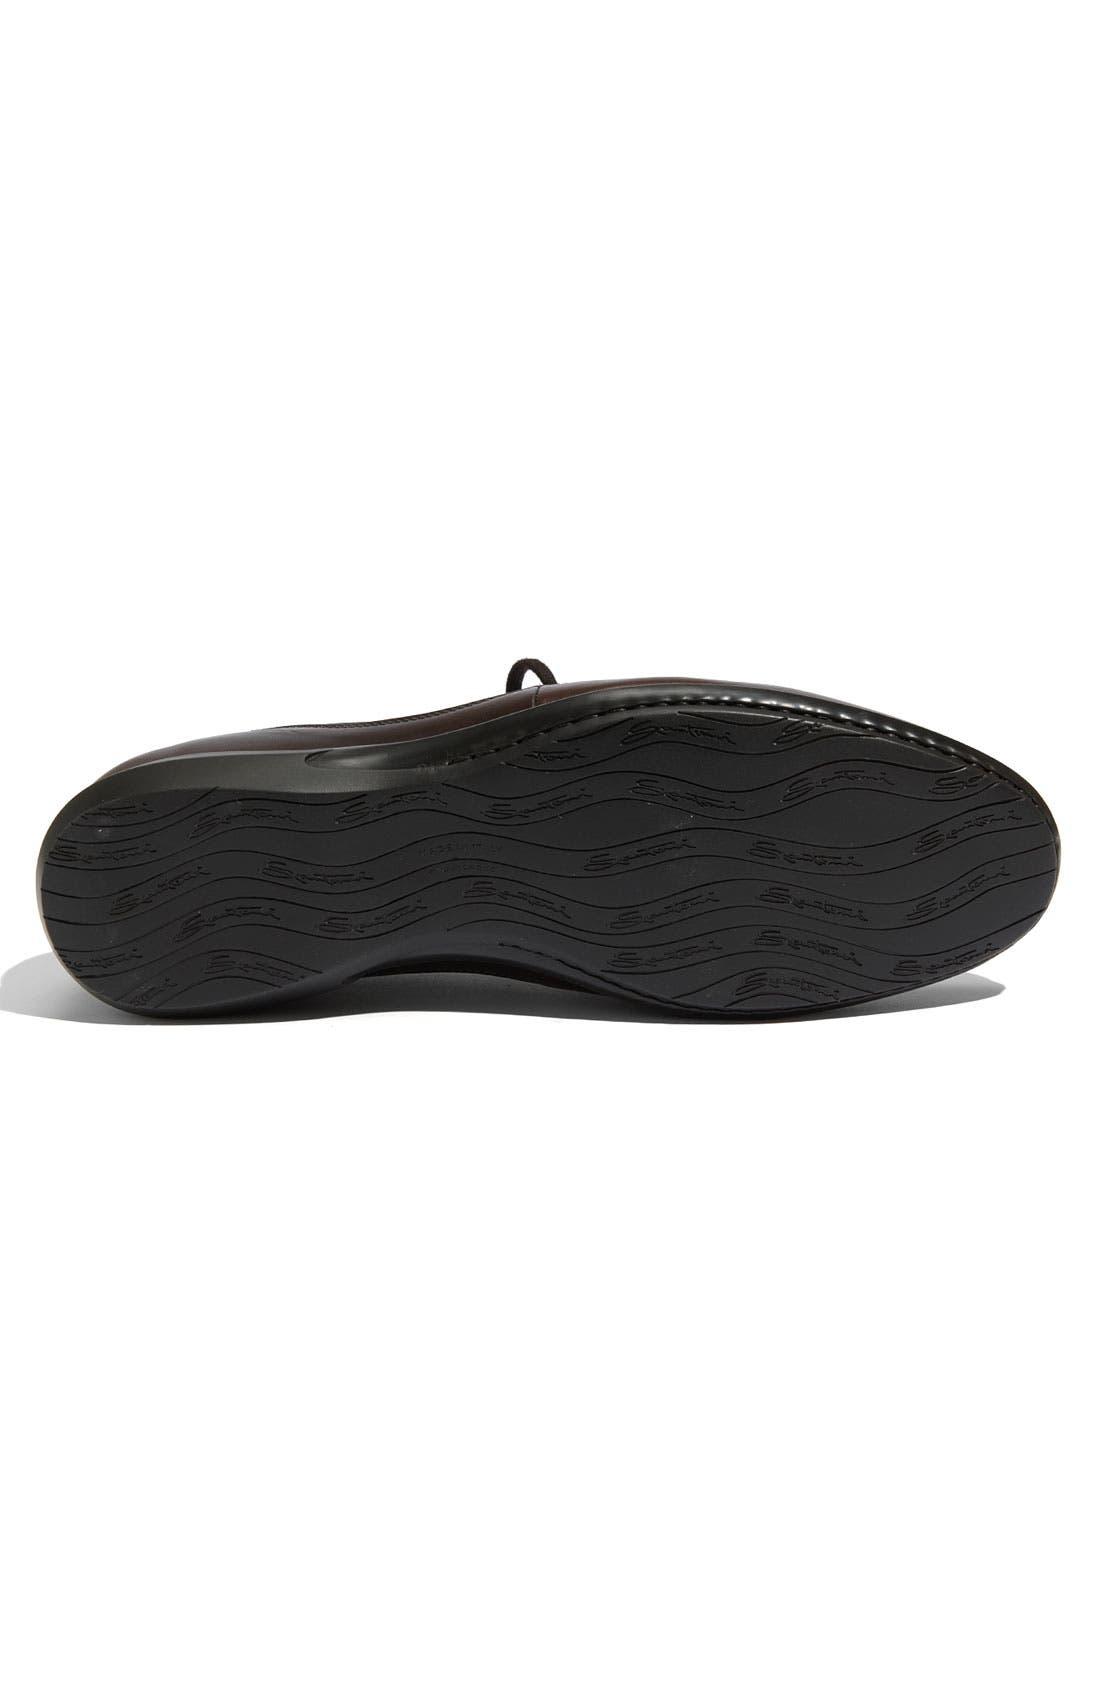 Alternate Image 4  - Santoni 'Marlin' Sneaker (Men)